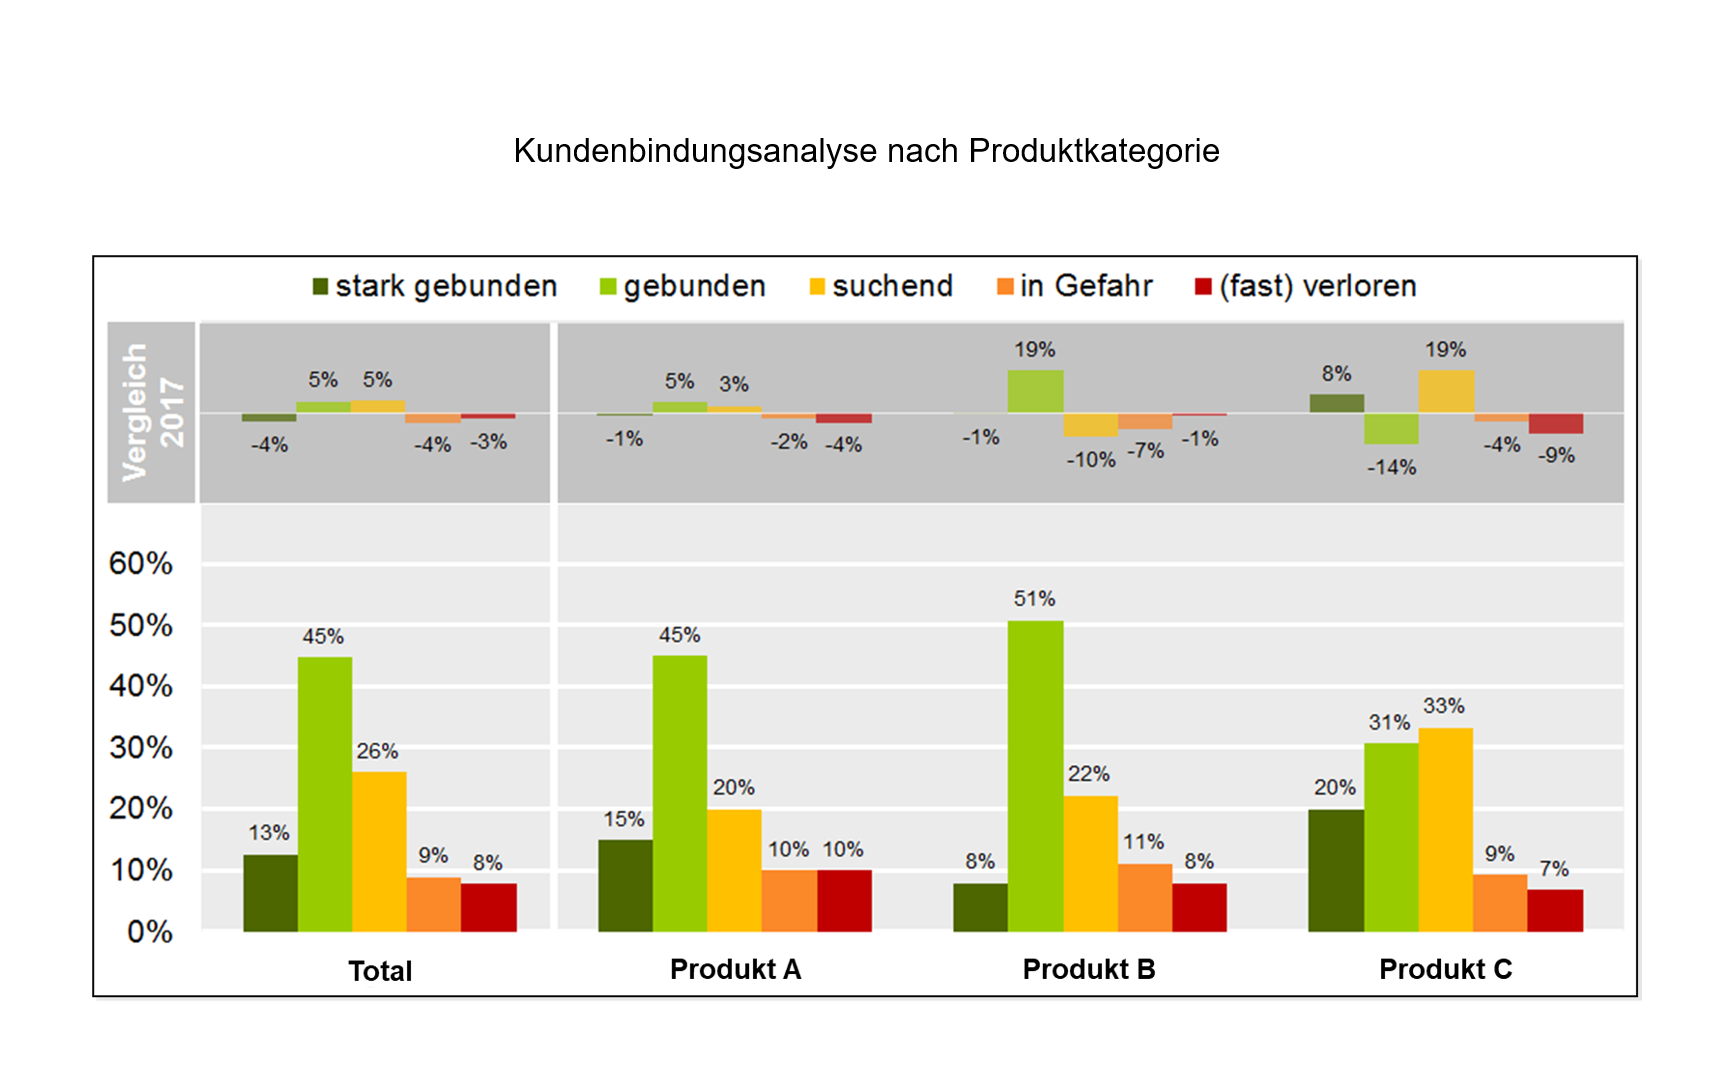 B2C Kundenbindungsanalyse nach Produktkategorie